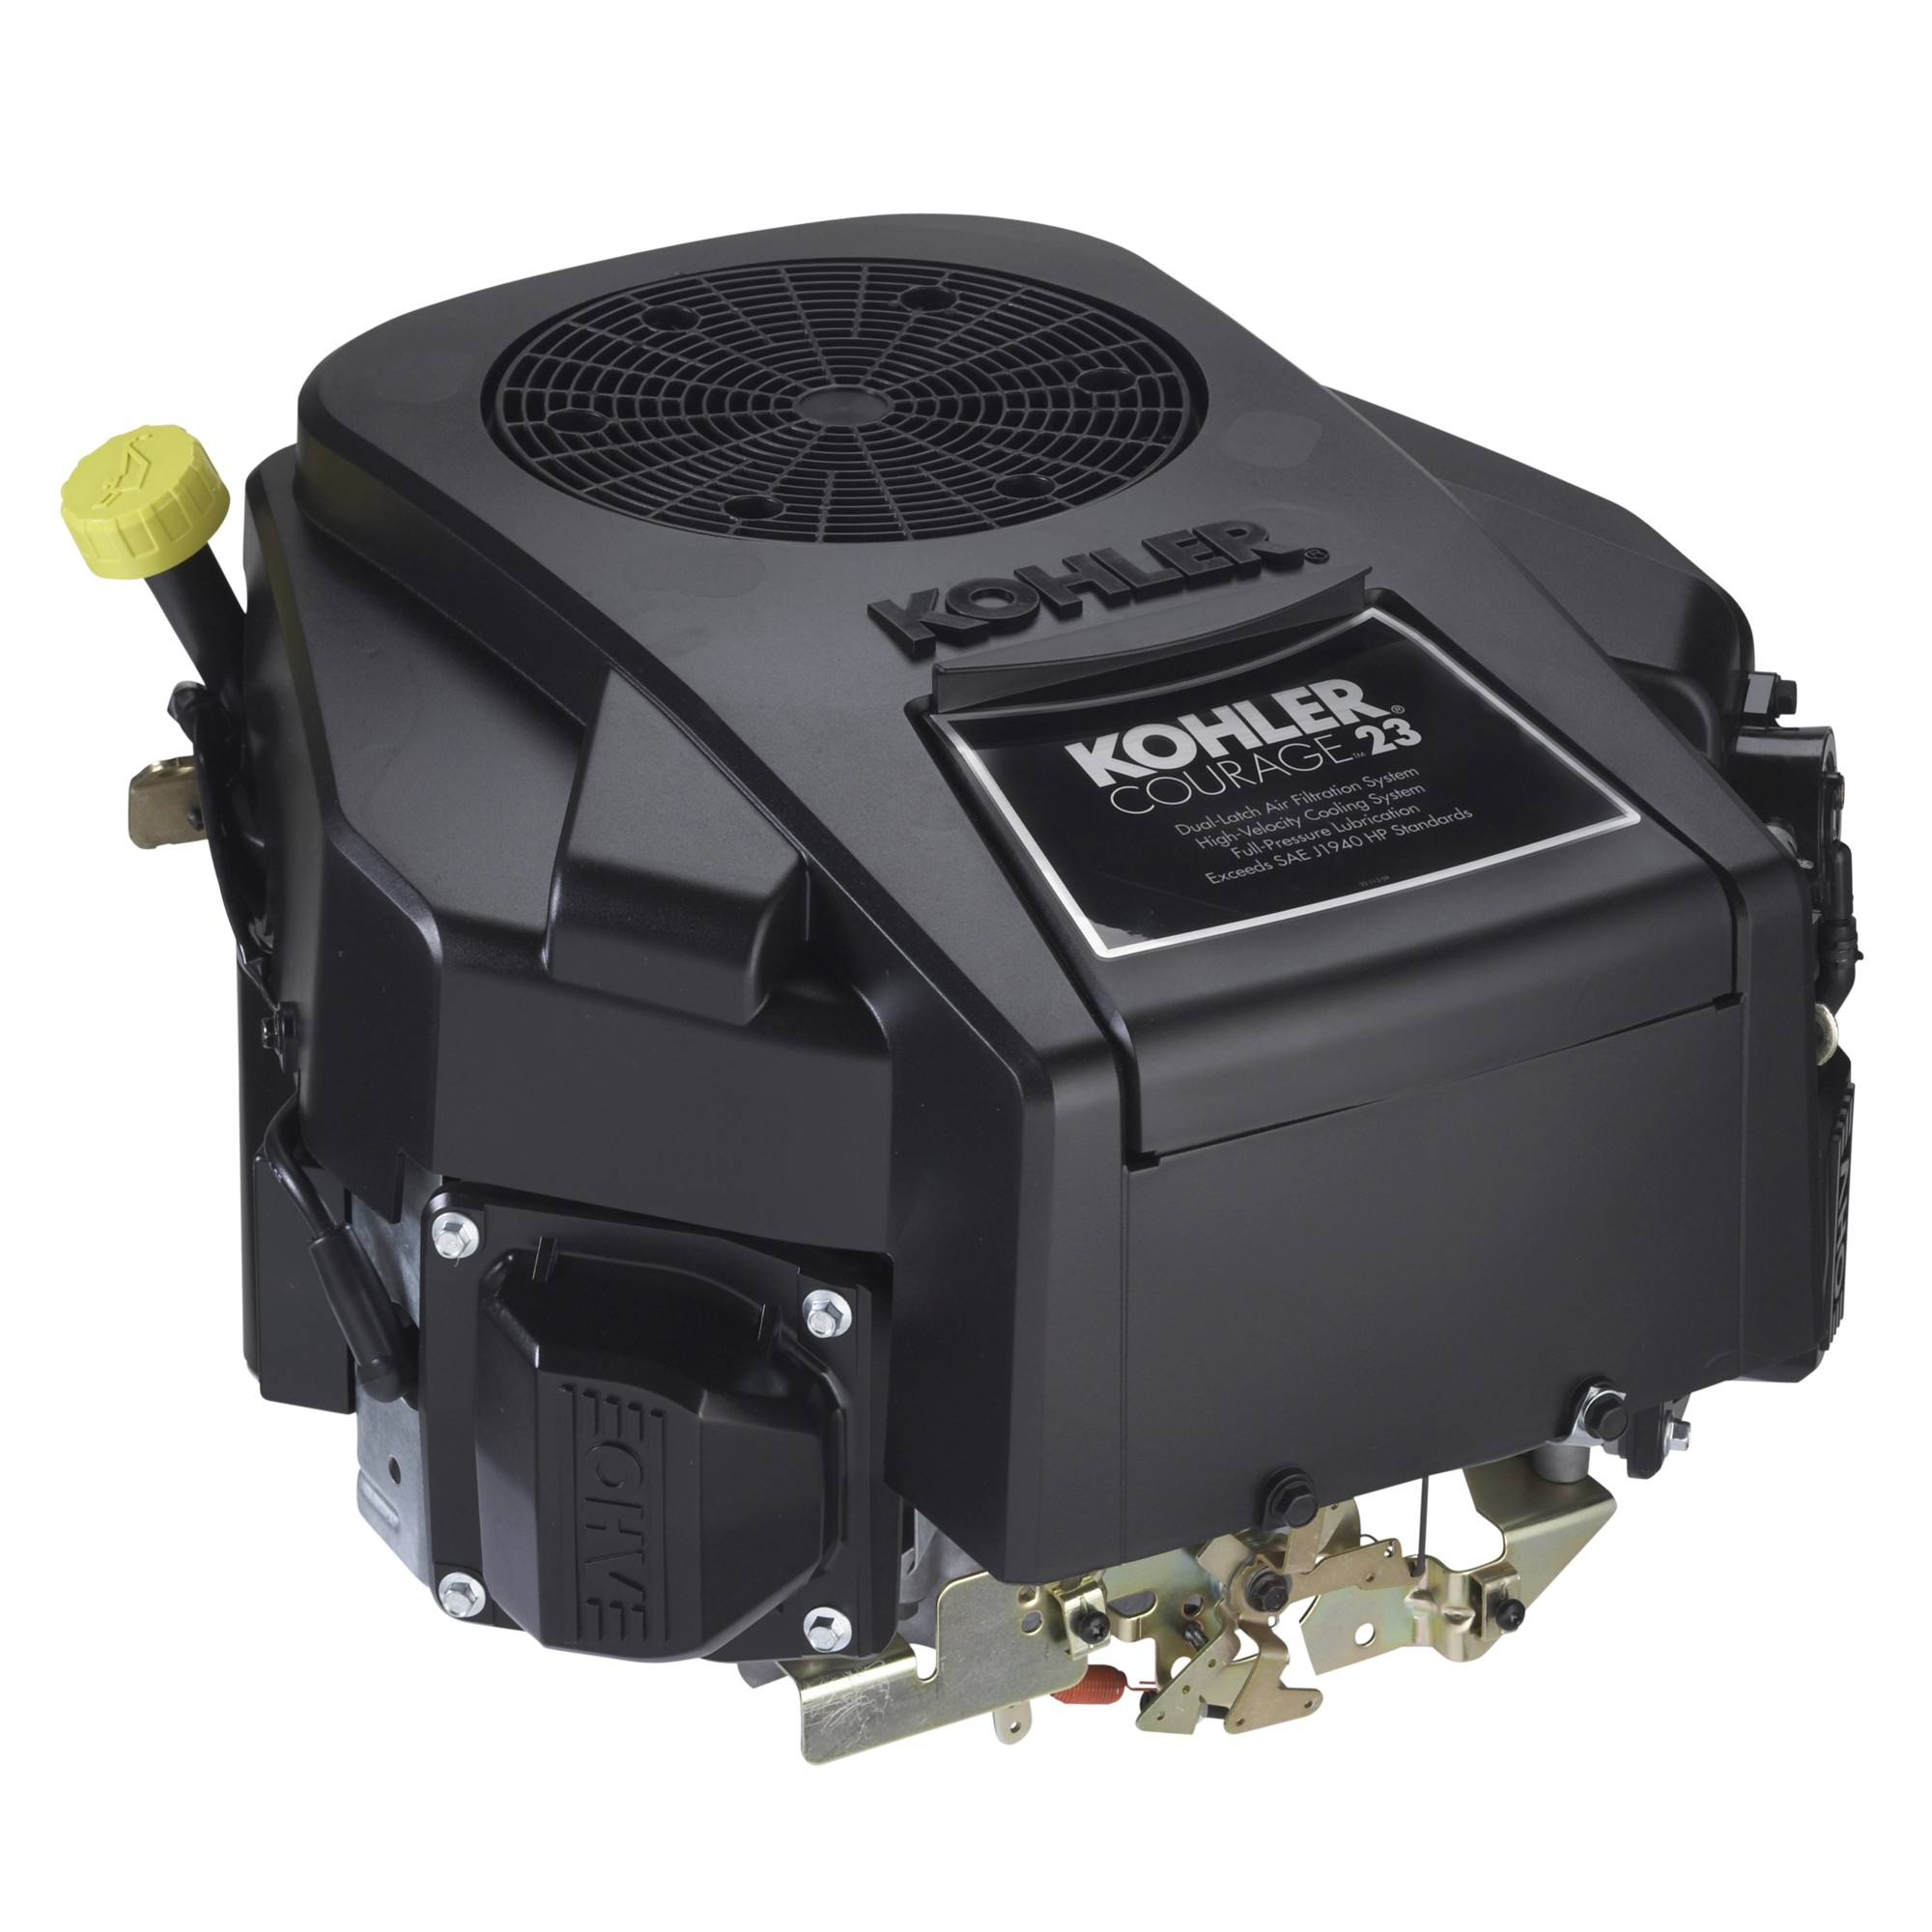 Courage 23 Hp Kohler Engine Diagram Trusted Wiring Diagrams 15 5hp Charging Engines Sv720 Product Detail Honda